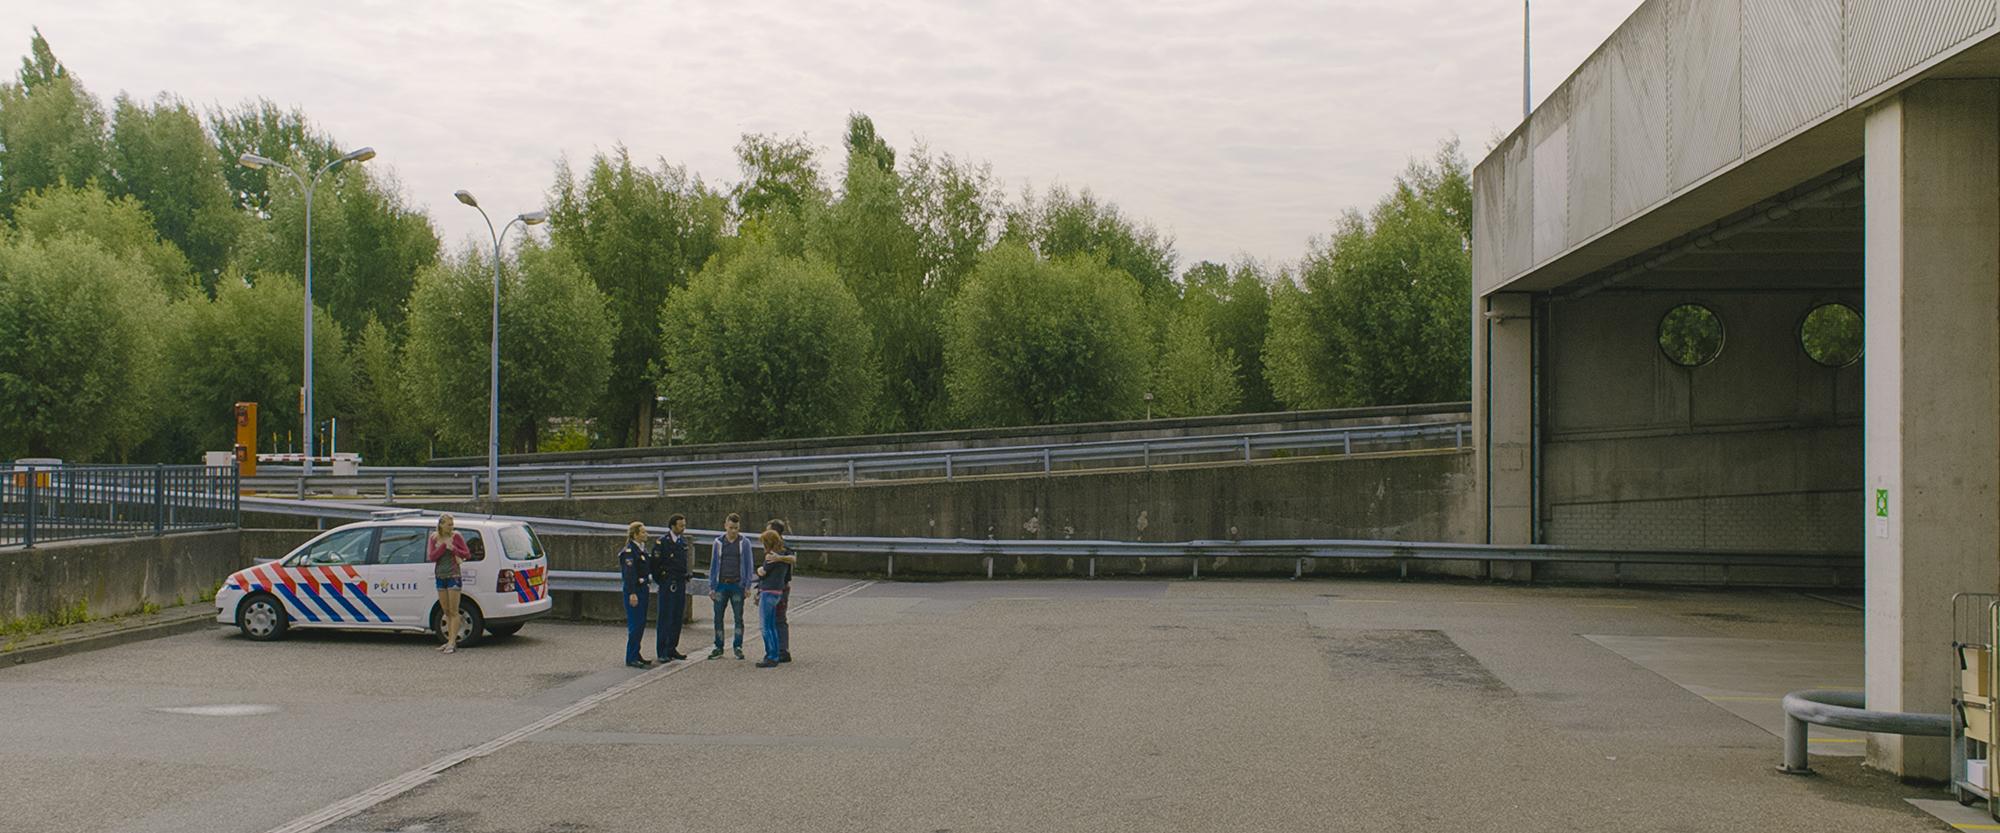 Between 10 and 12: una scena del film di Peter Hoogendoorn